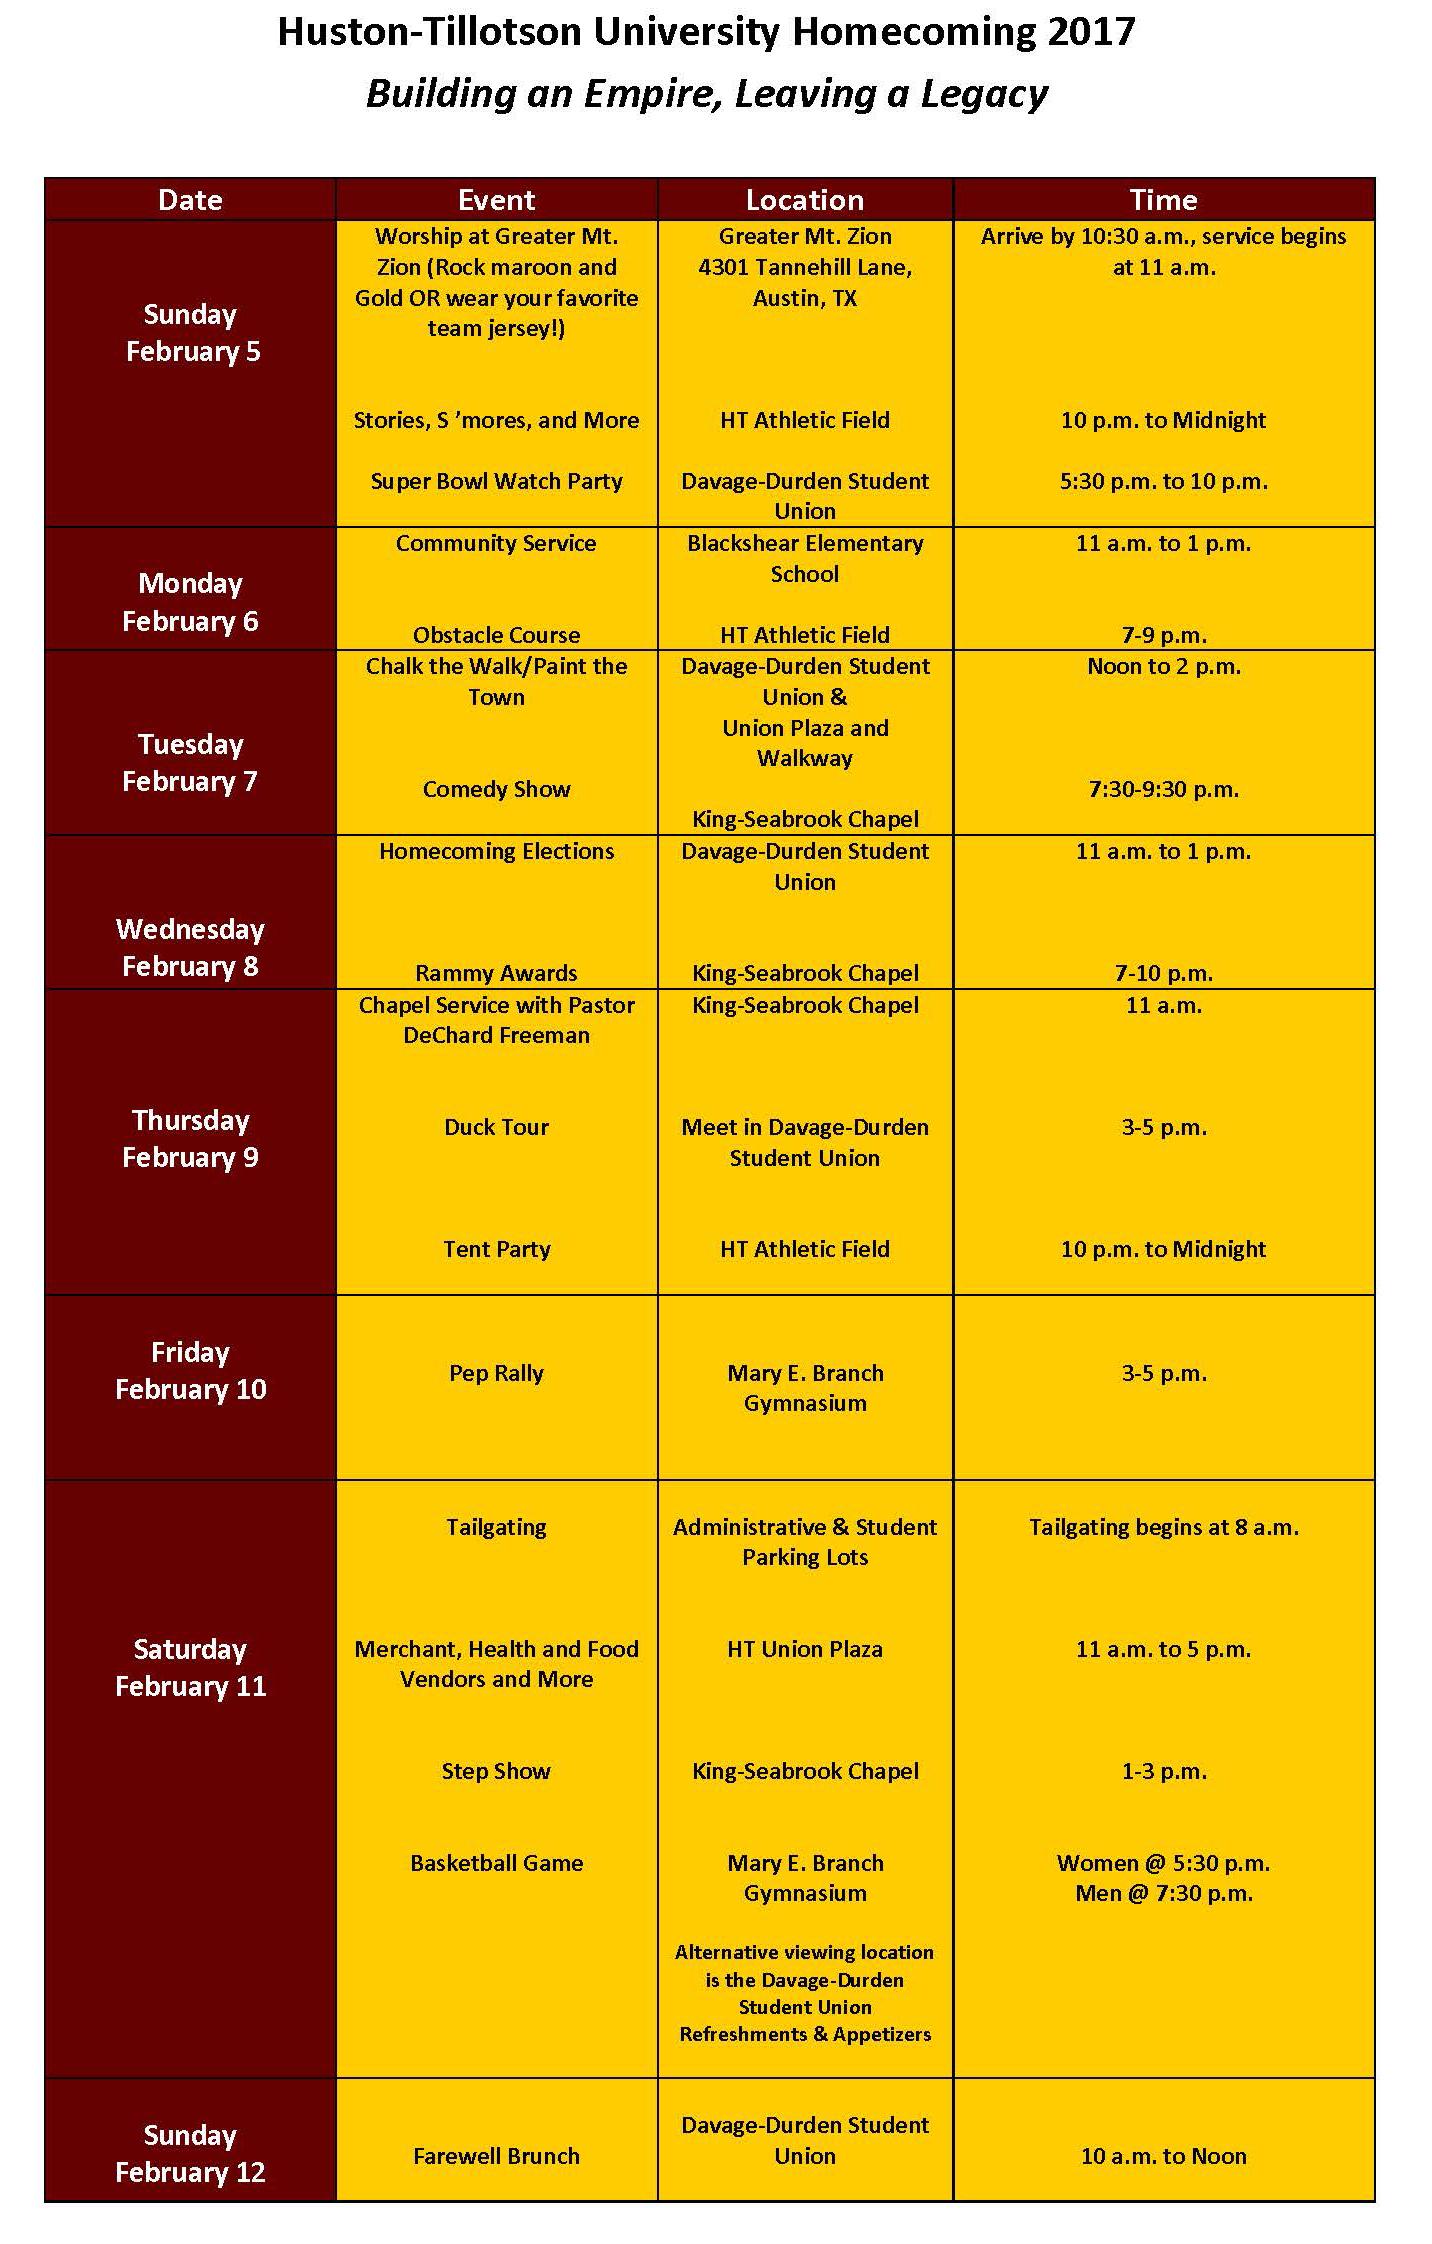 Homecoming 2017 Schedule